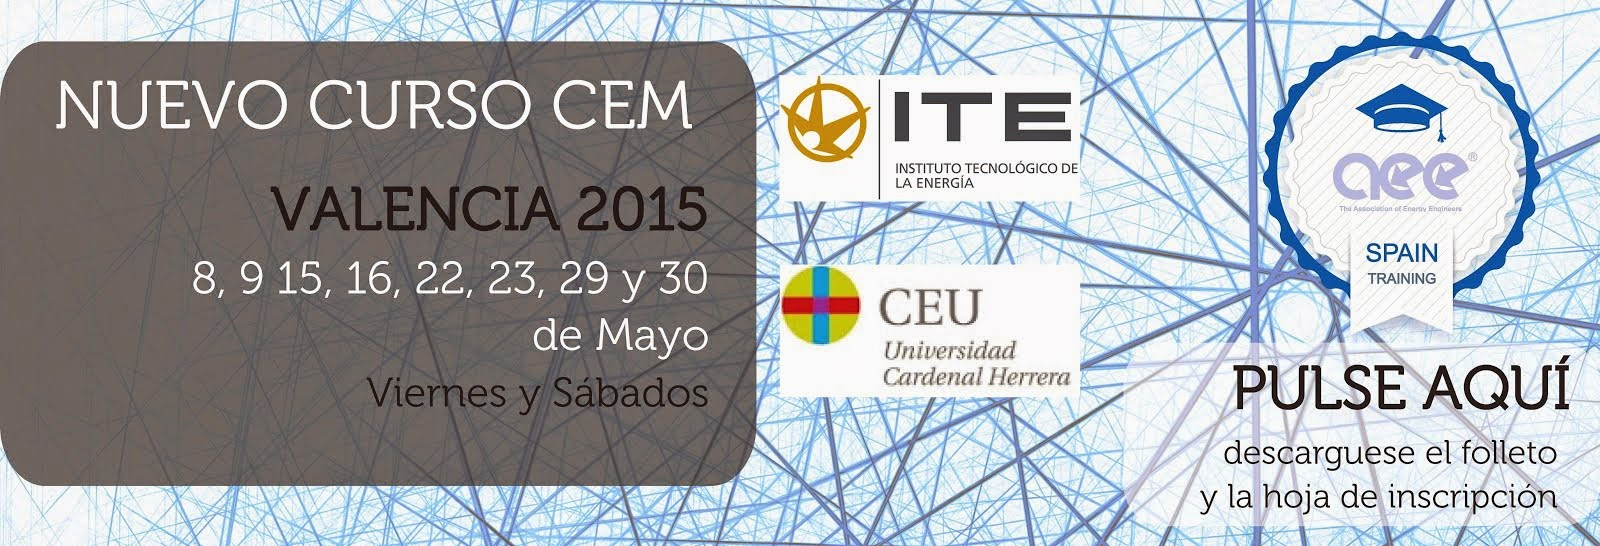 Curso CEM(R) Valencia Mayo 2015